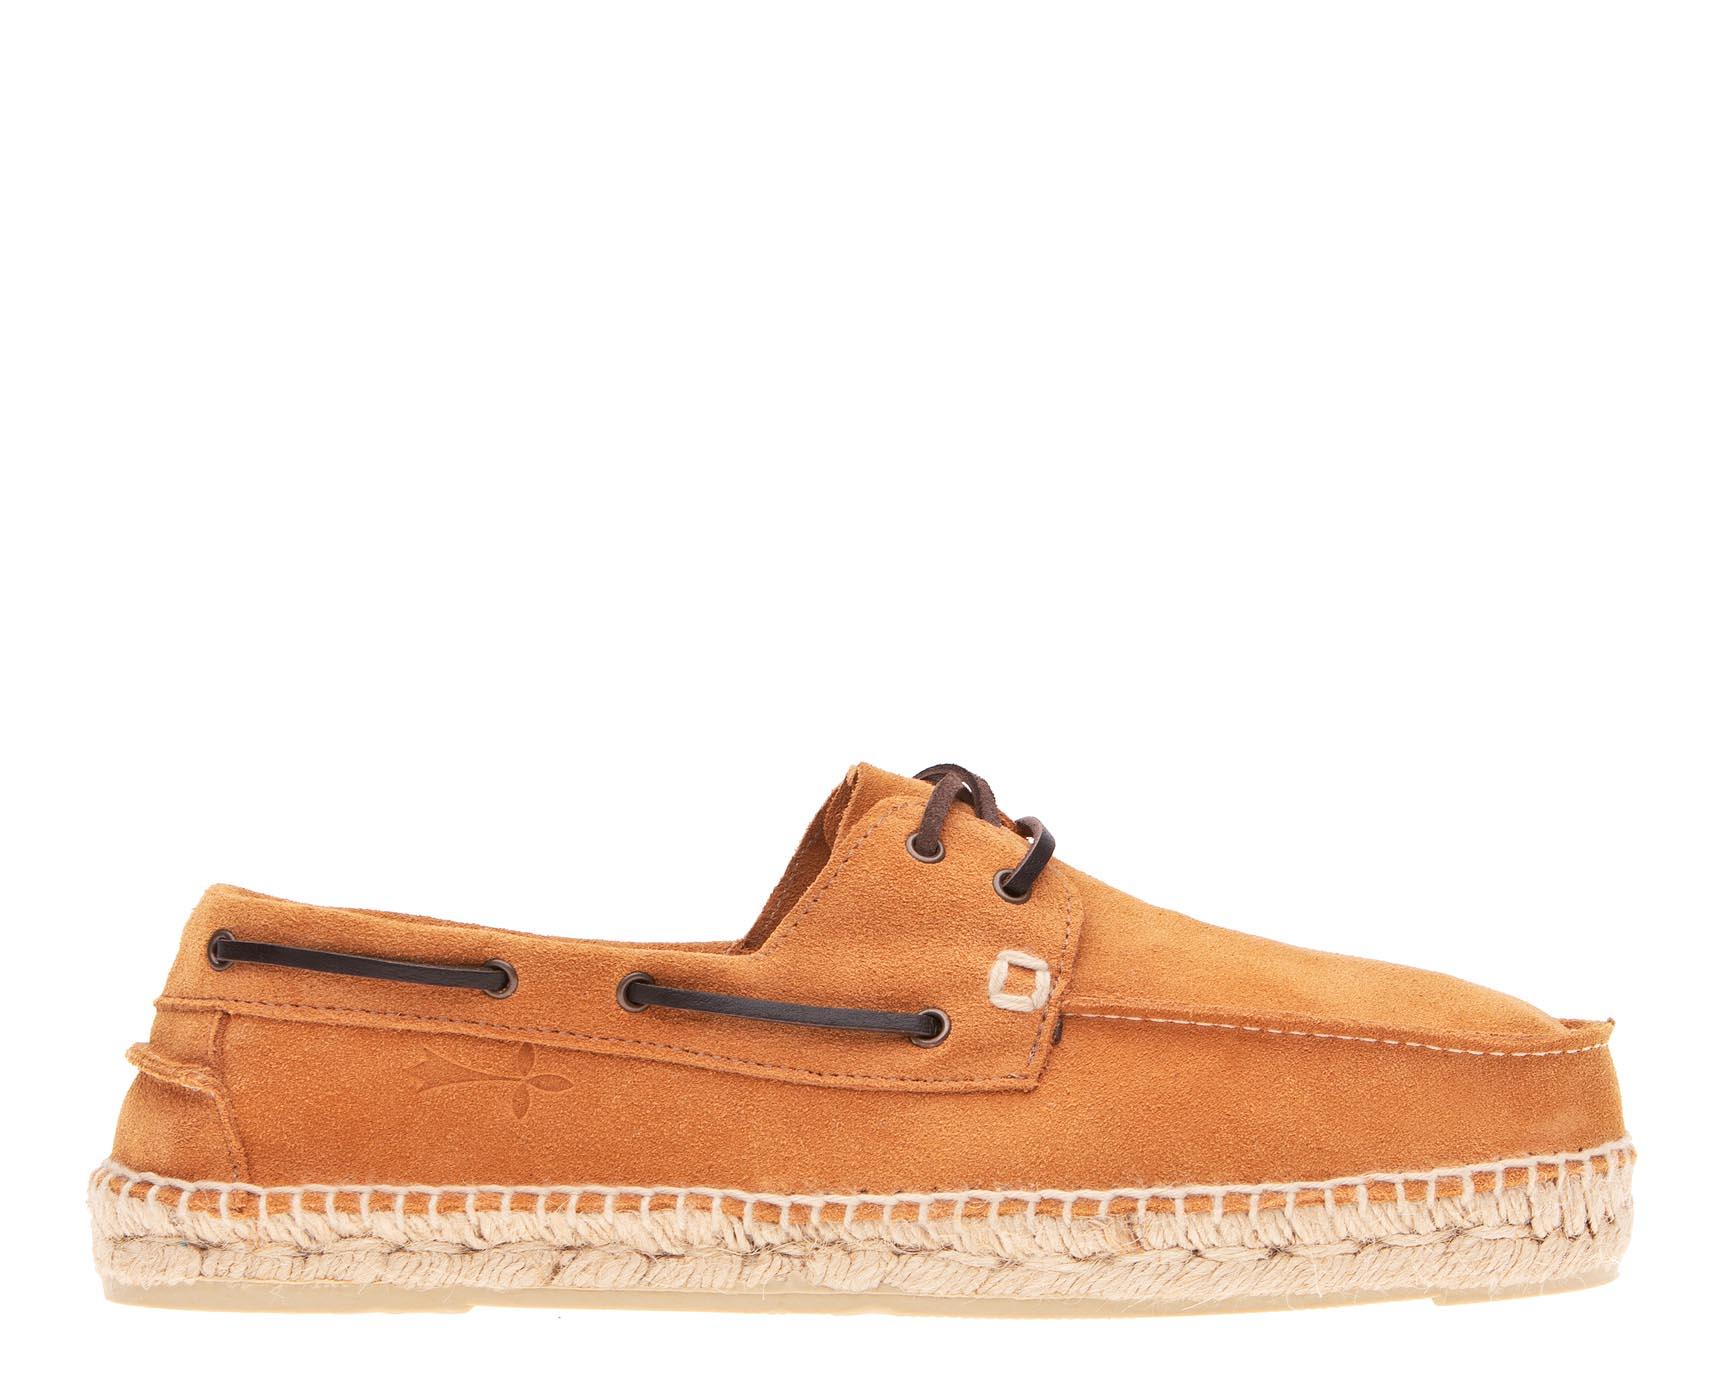 Boat Shoes - Hamptons - Cuero